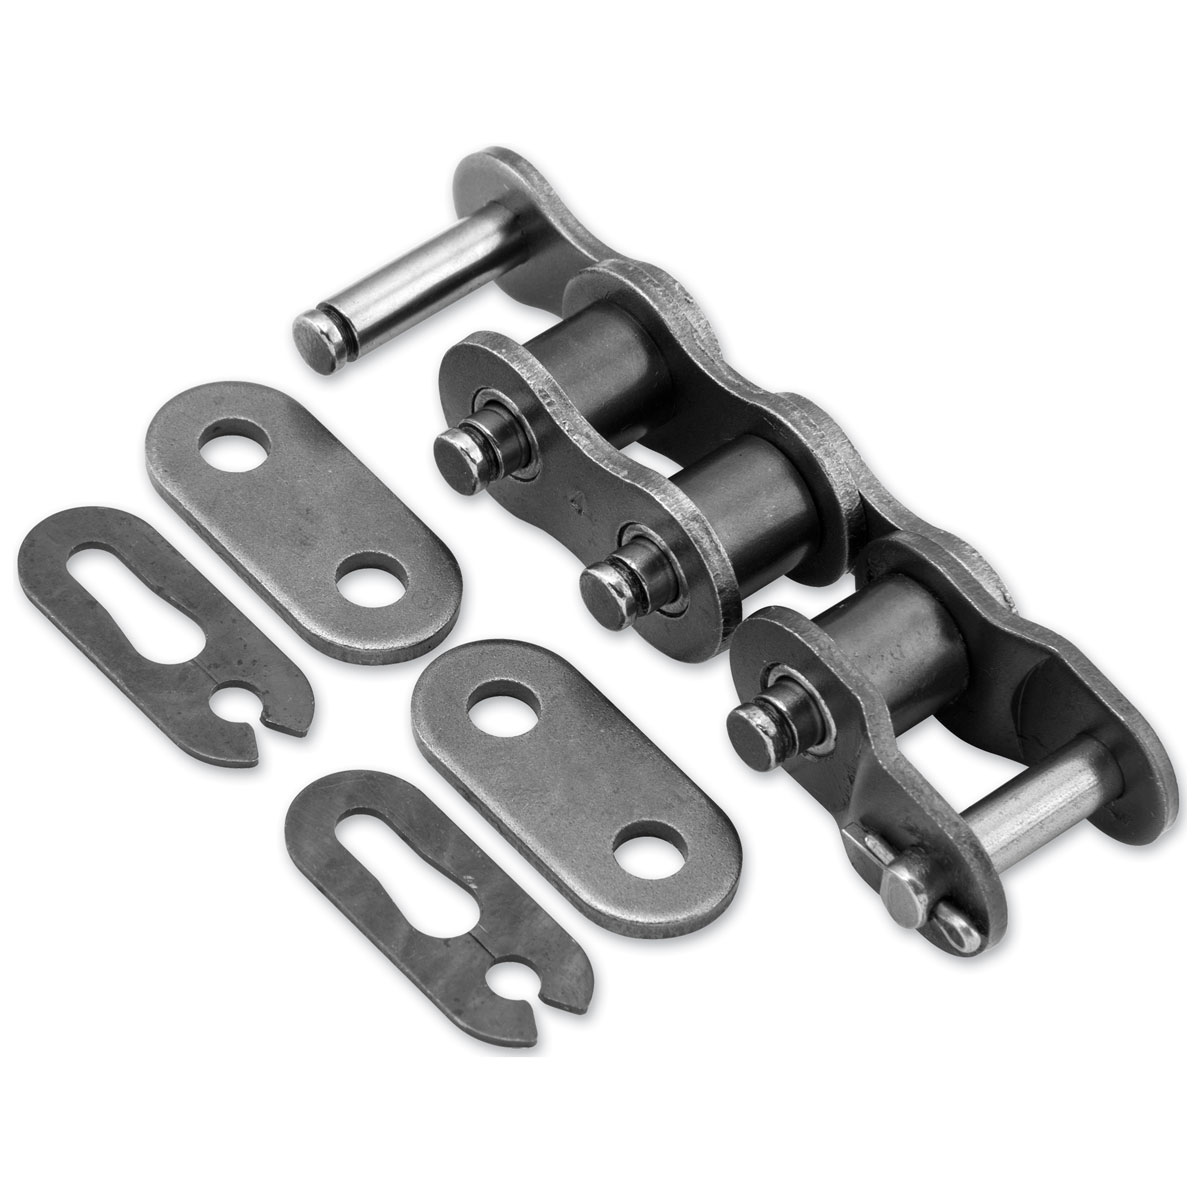 BikeMaster 530 HD Precision Roller Chain Clip Link Kit